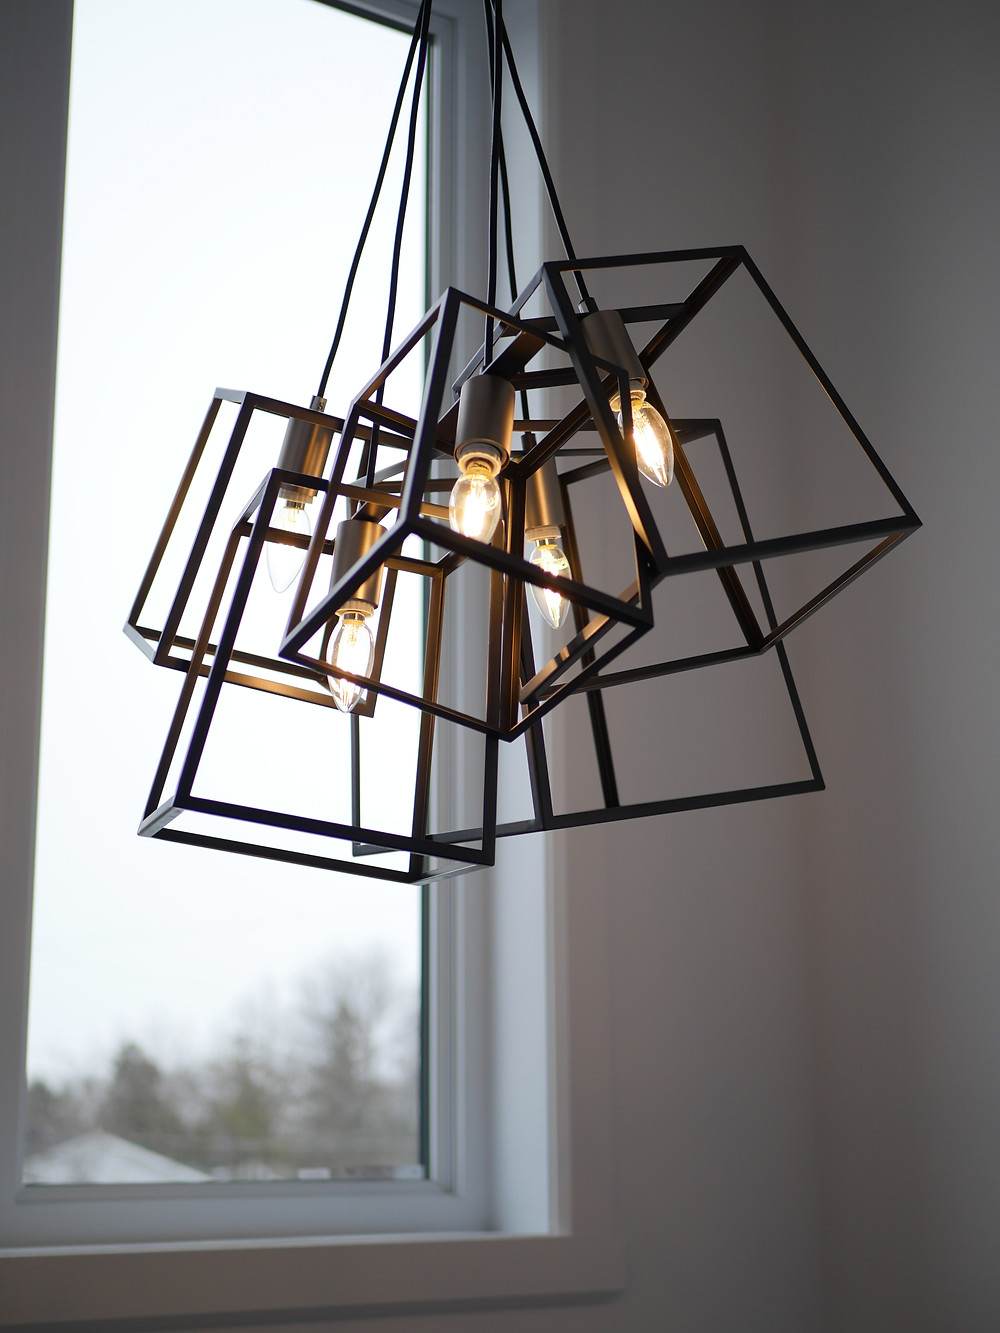 Hanging lantern style lights